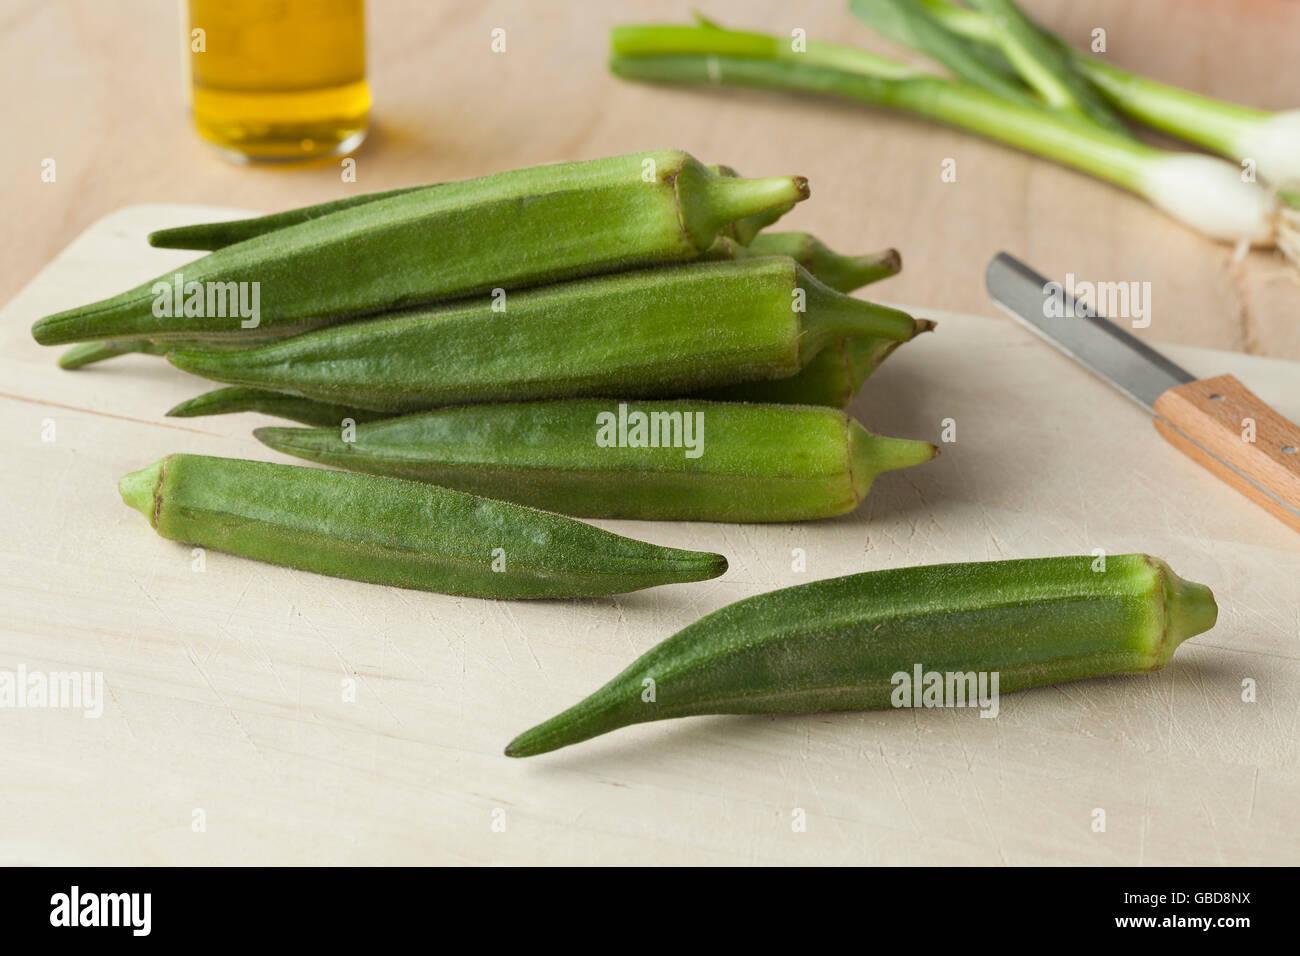 Fresh green okra on a wooden cutting board - Stock Image